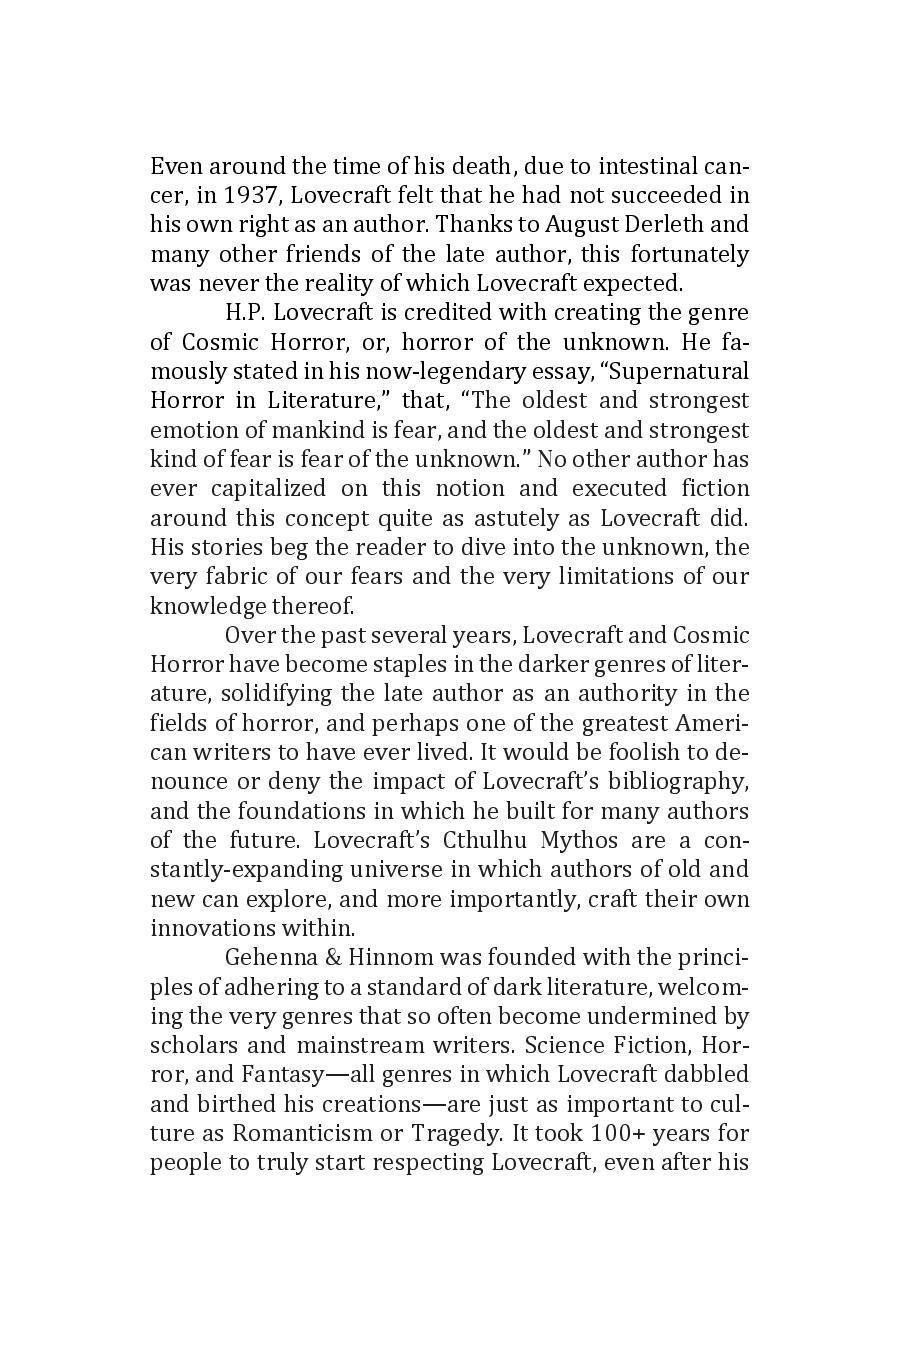 Hinnom Magazine 002 Manuscript E-Book 2-page-004